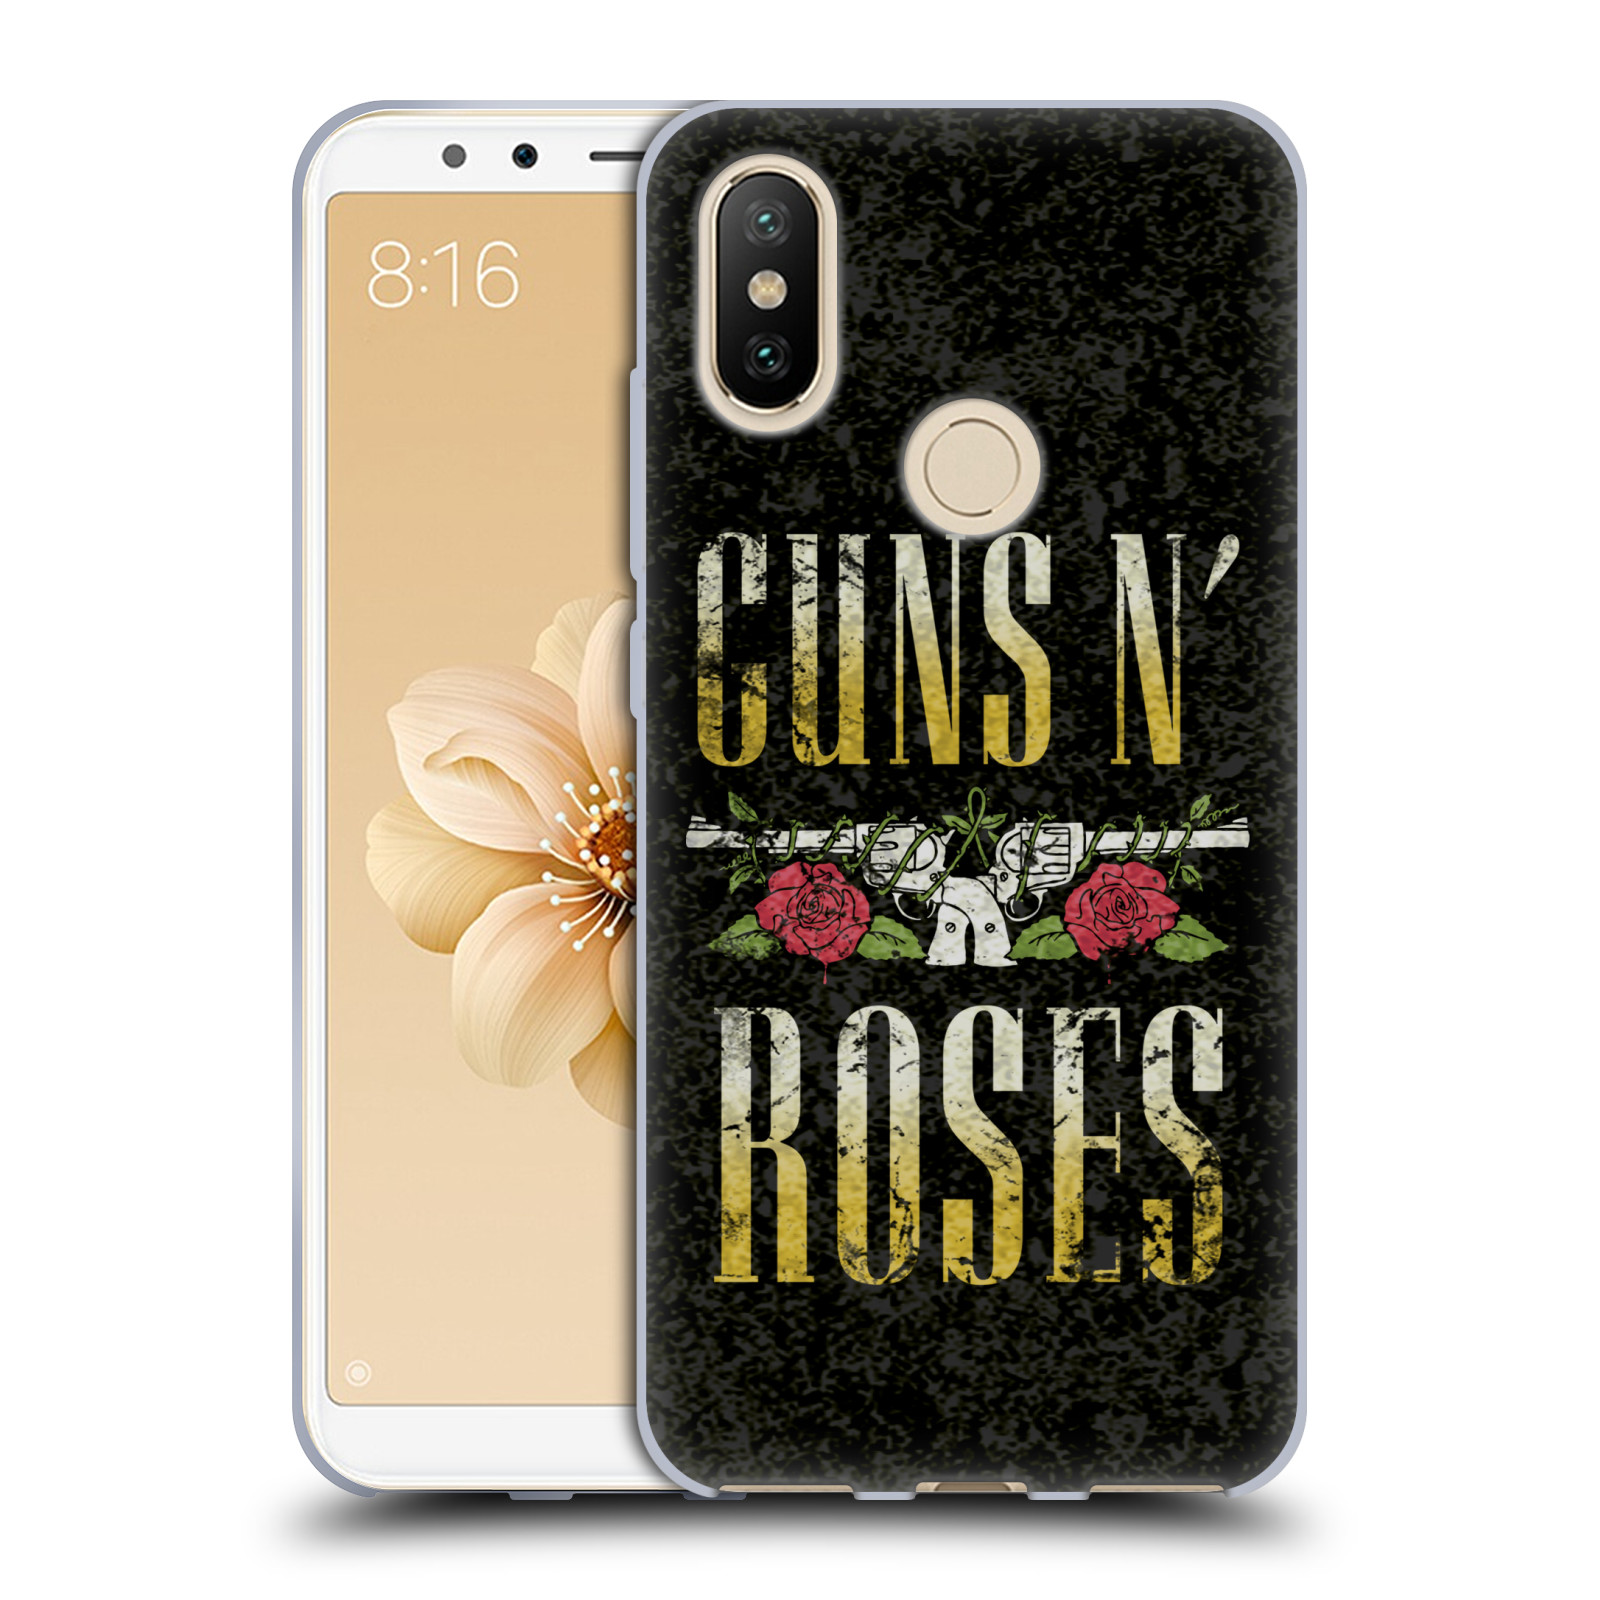 b2db1b168 Silikonové pouzdro na mobil Xiaomi Mi A2 hudební skupina Guns N Roses text